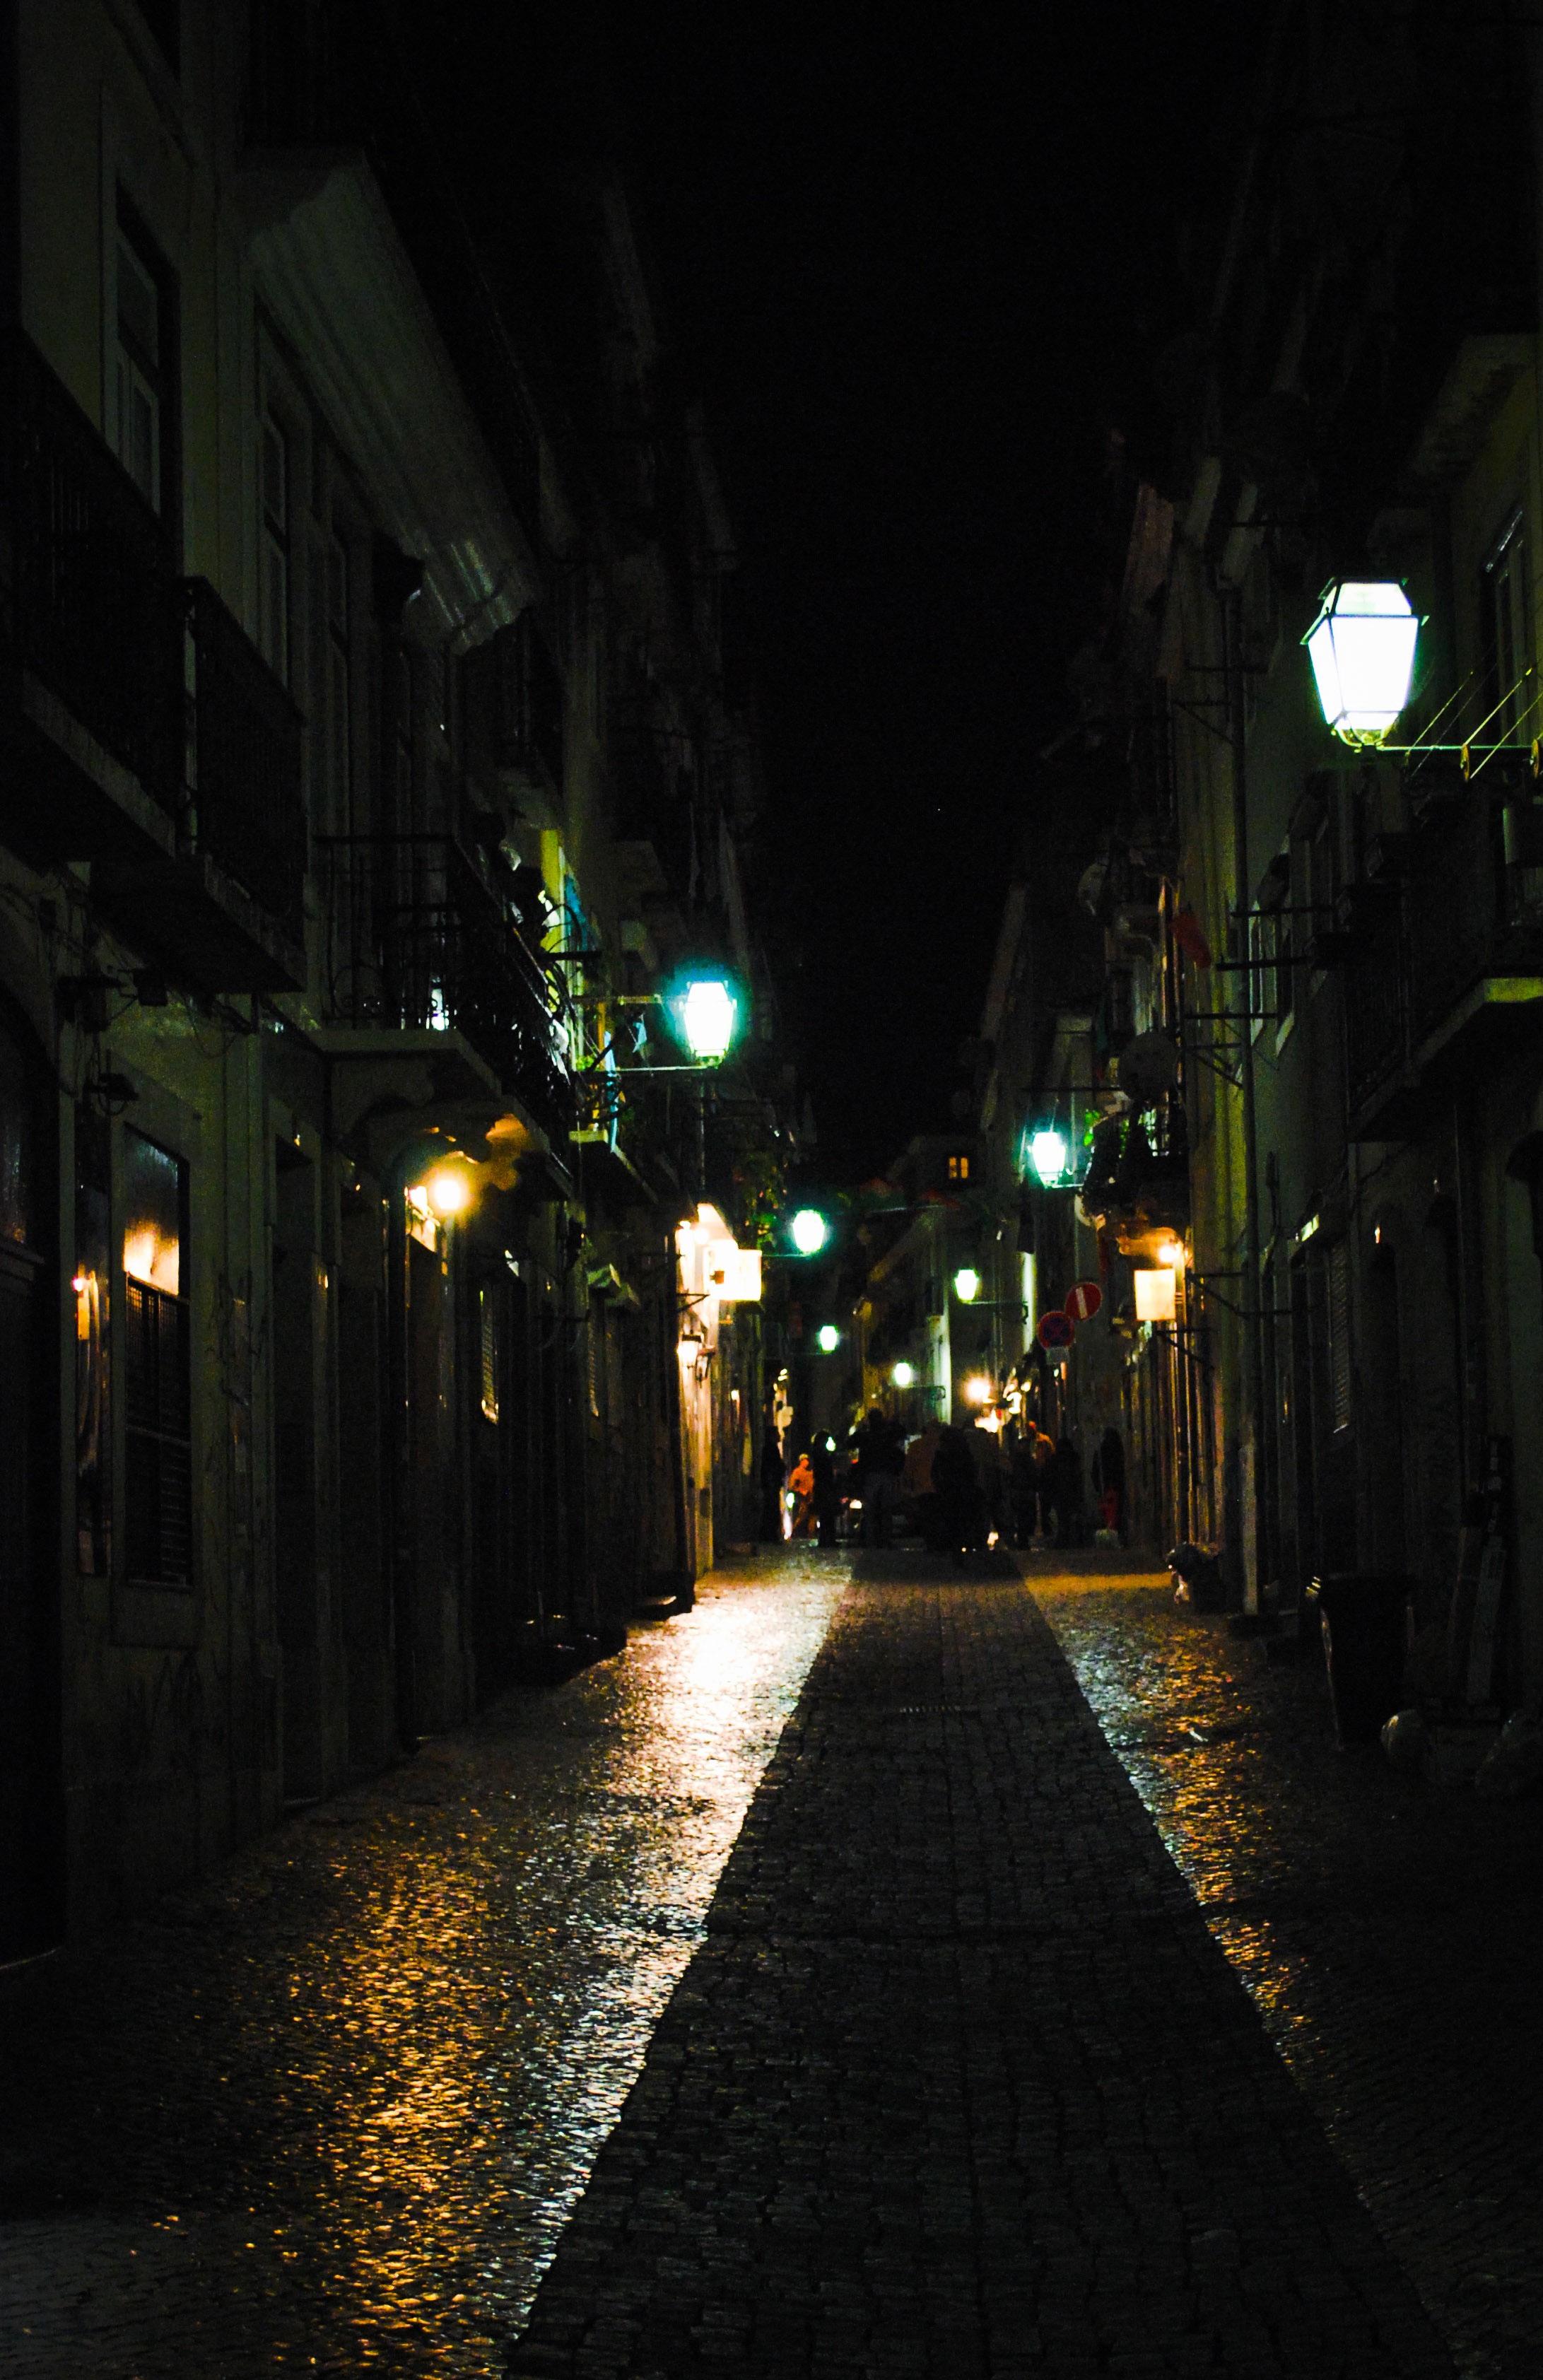 Light Road Street Night Alley Evening Darkness Street Light Lane Lighting Infrastructure Light Fixture Midnight Urban Area